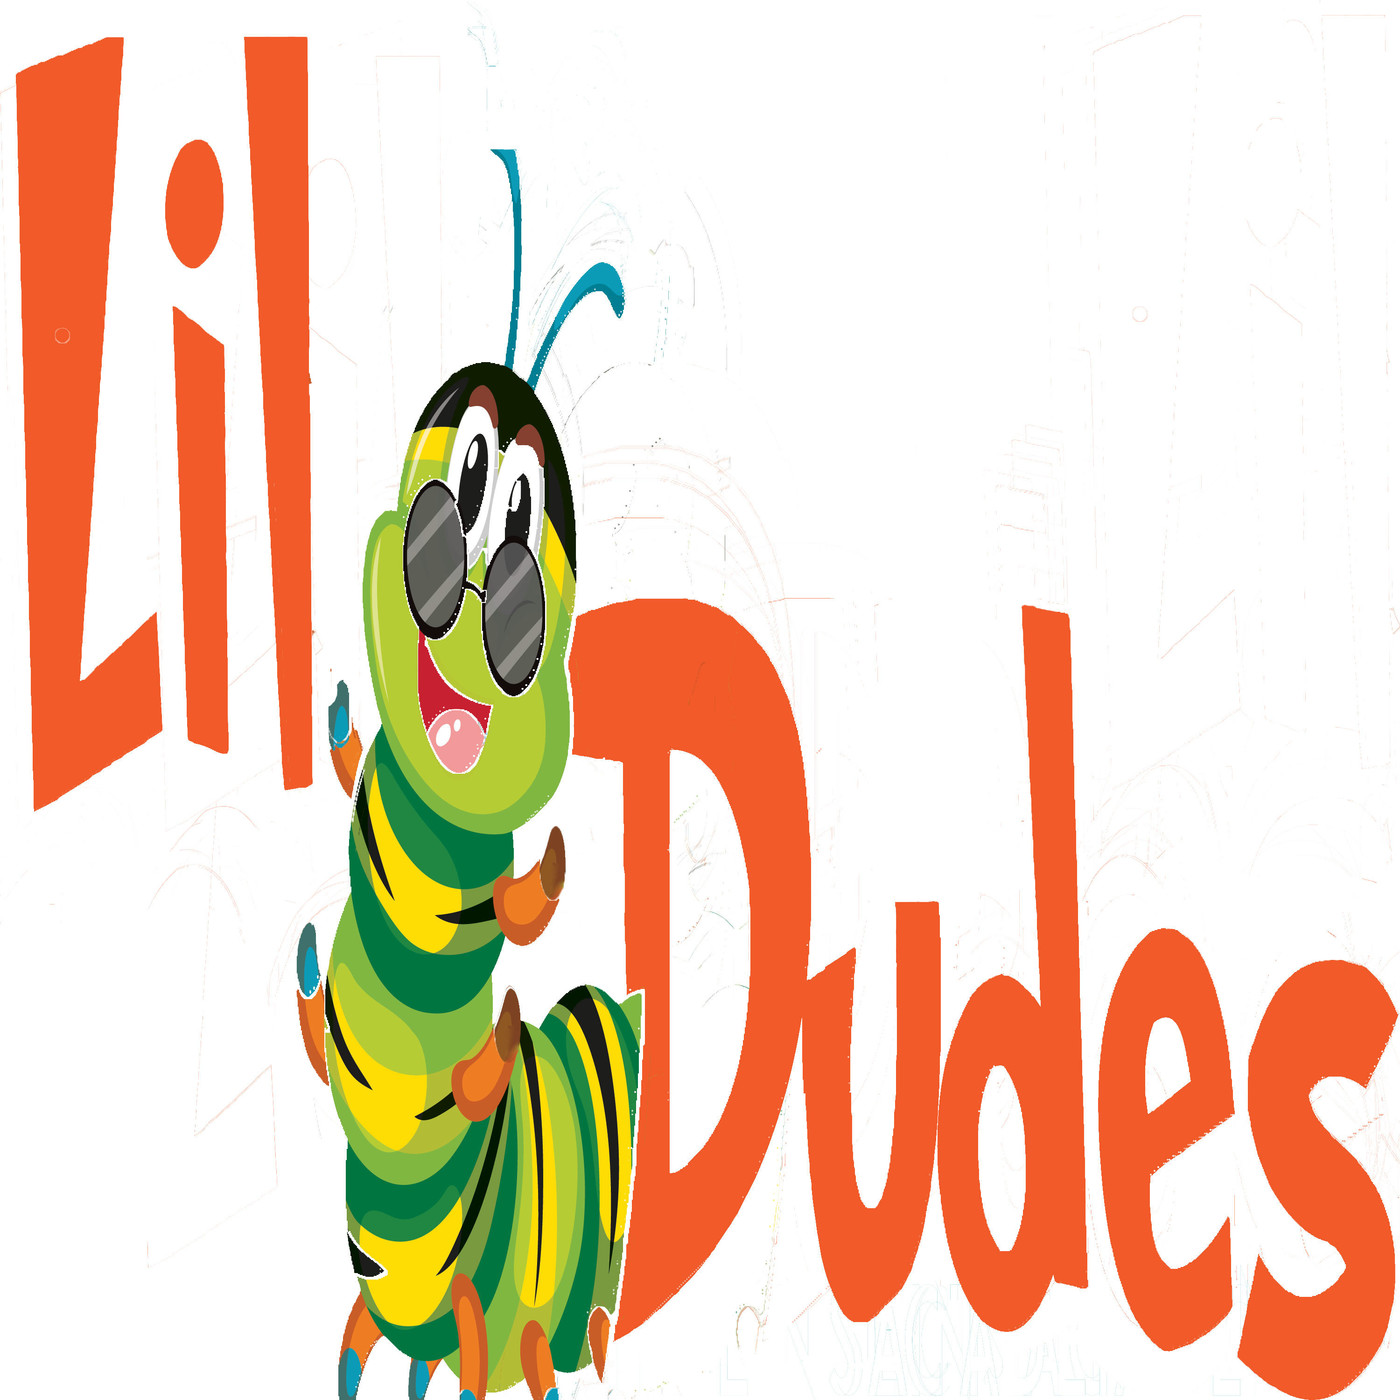 37. Two Bug-Nerds sharing their Bug-speriences (Feat. Gwen Erdosh)